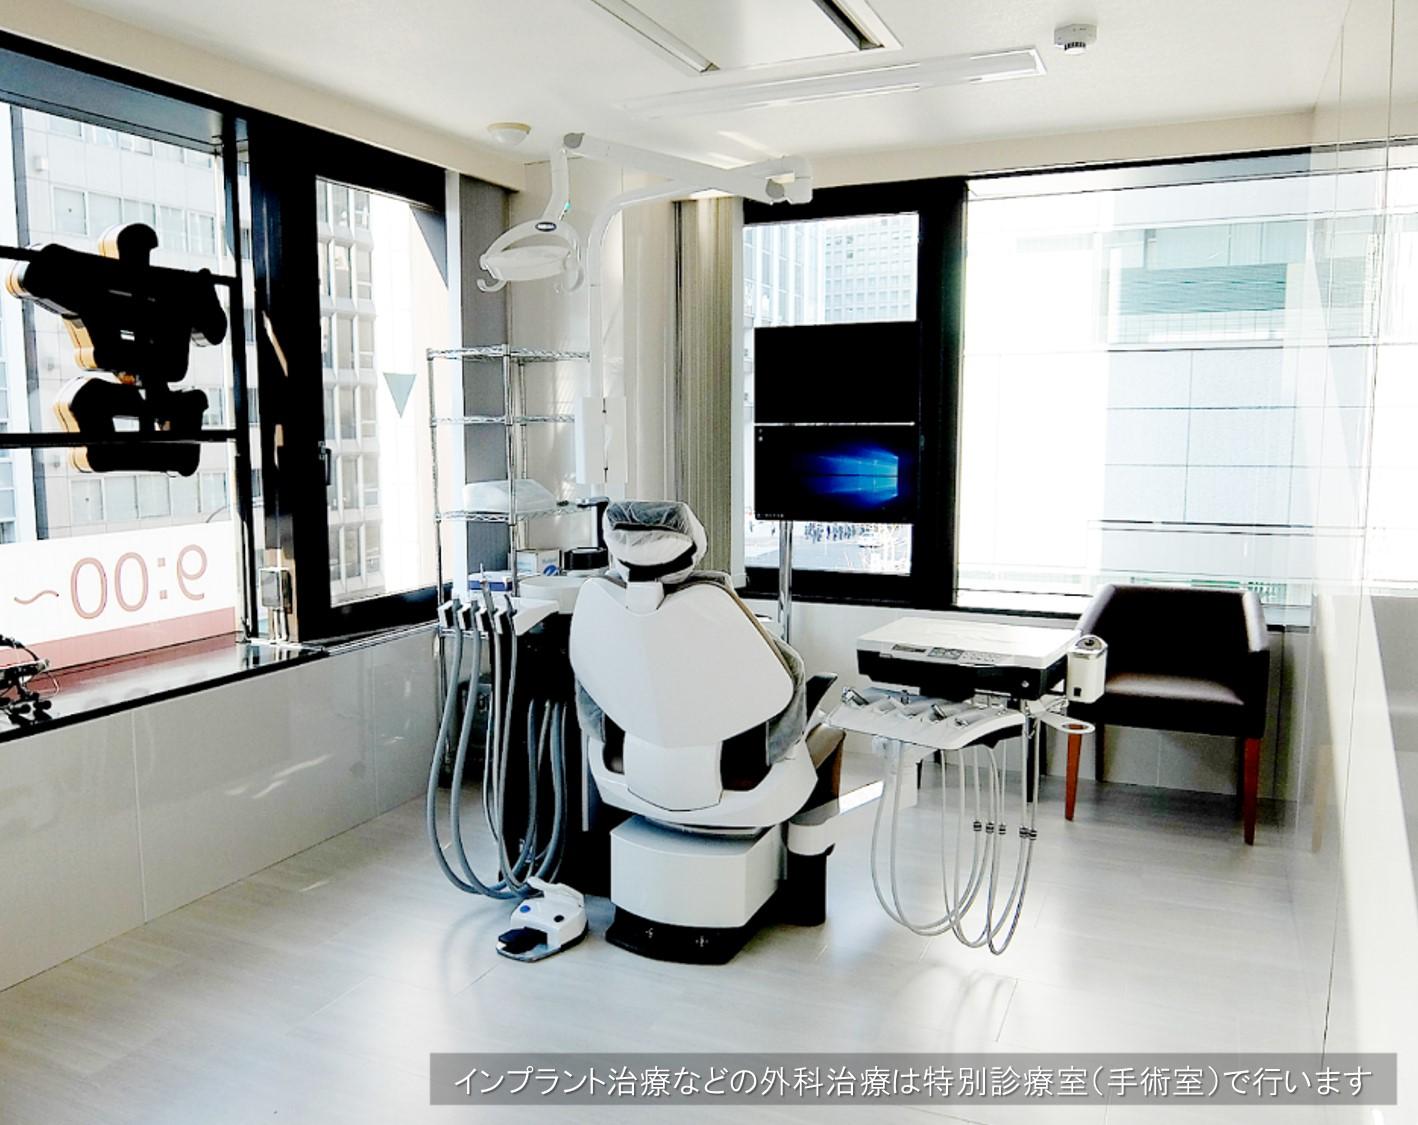 宮﨑歯科医院 インプラント用手術室 特別診療室